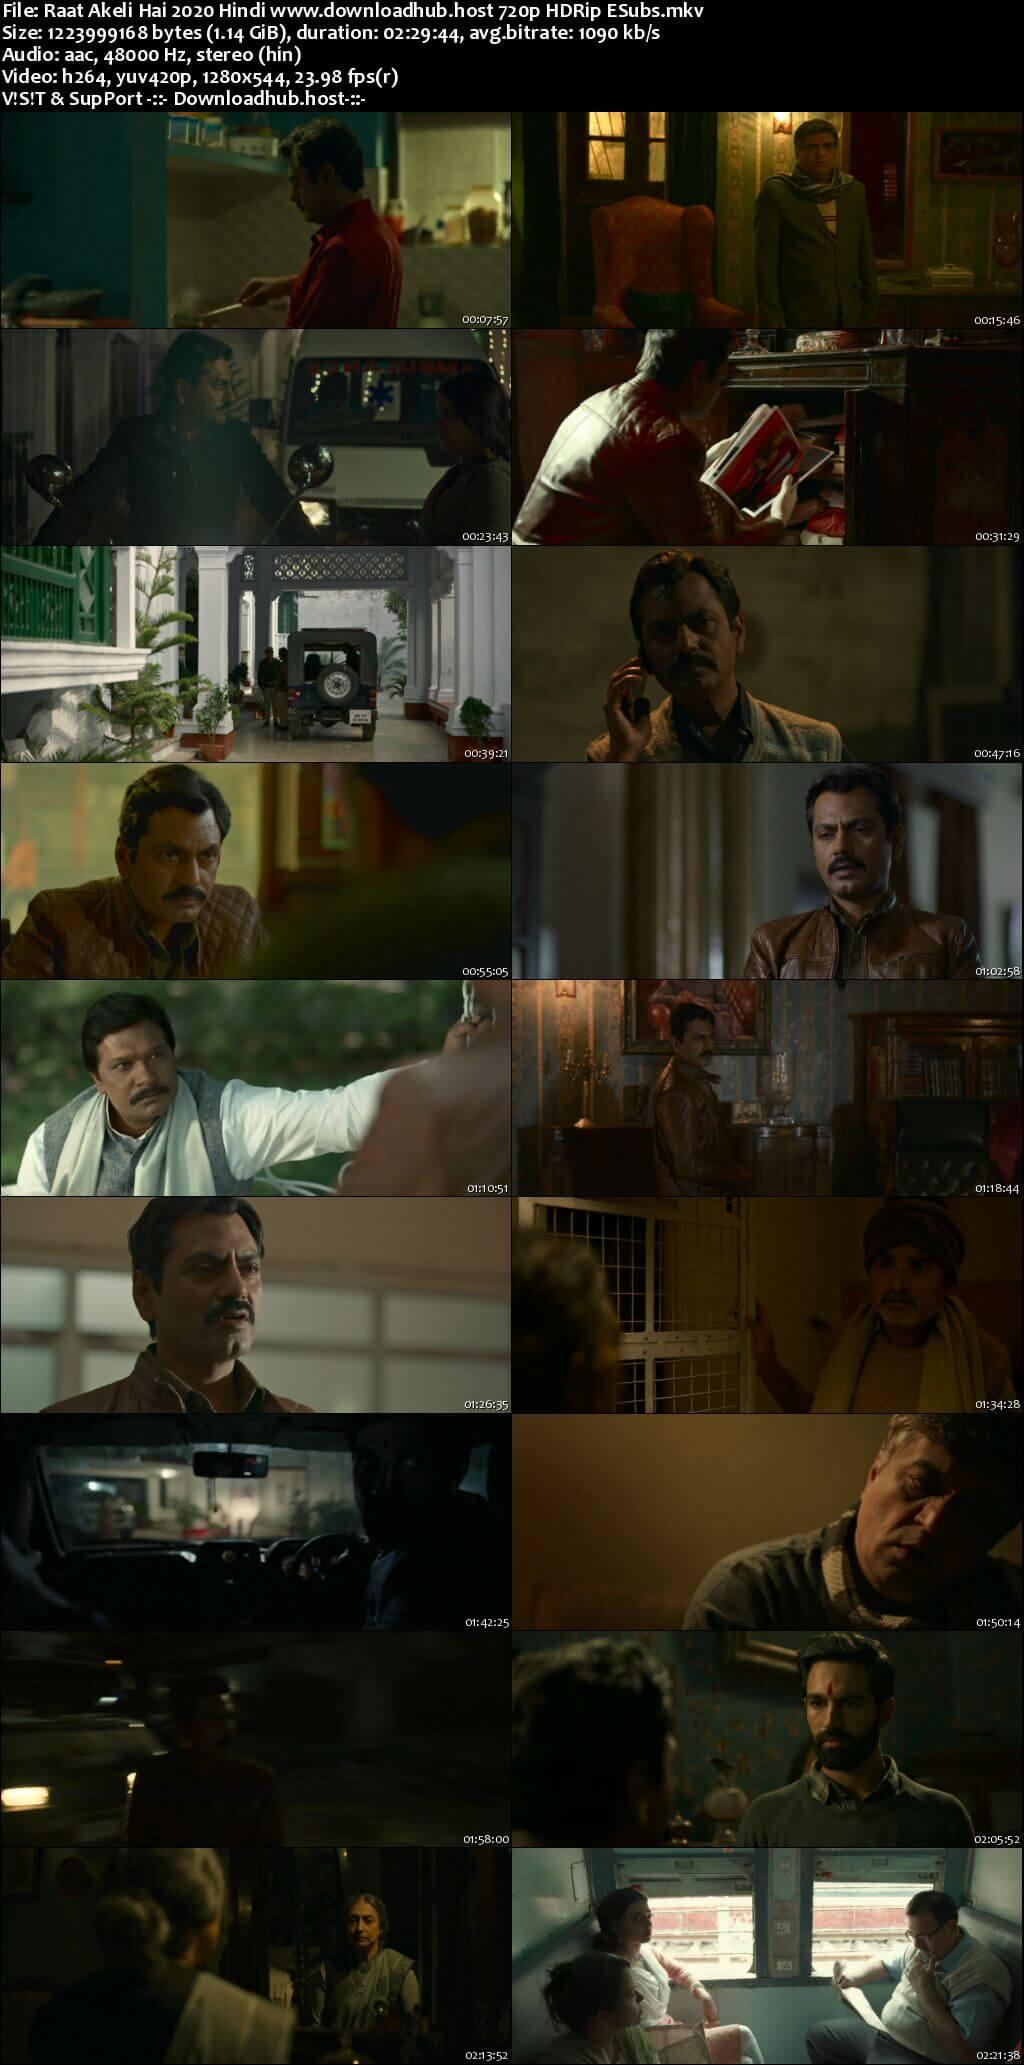 Raat Akeli Hai 2020 Hindi 720p HDRip ESubs